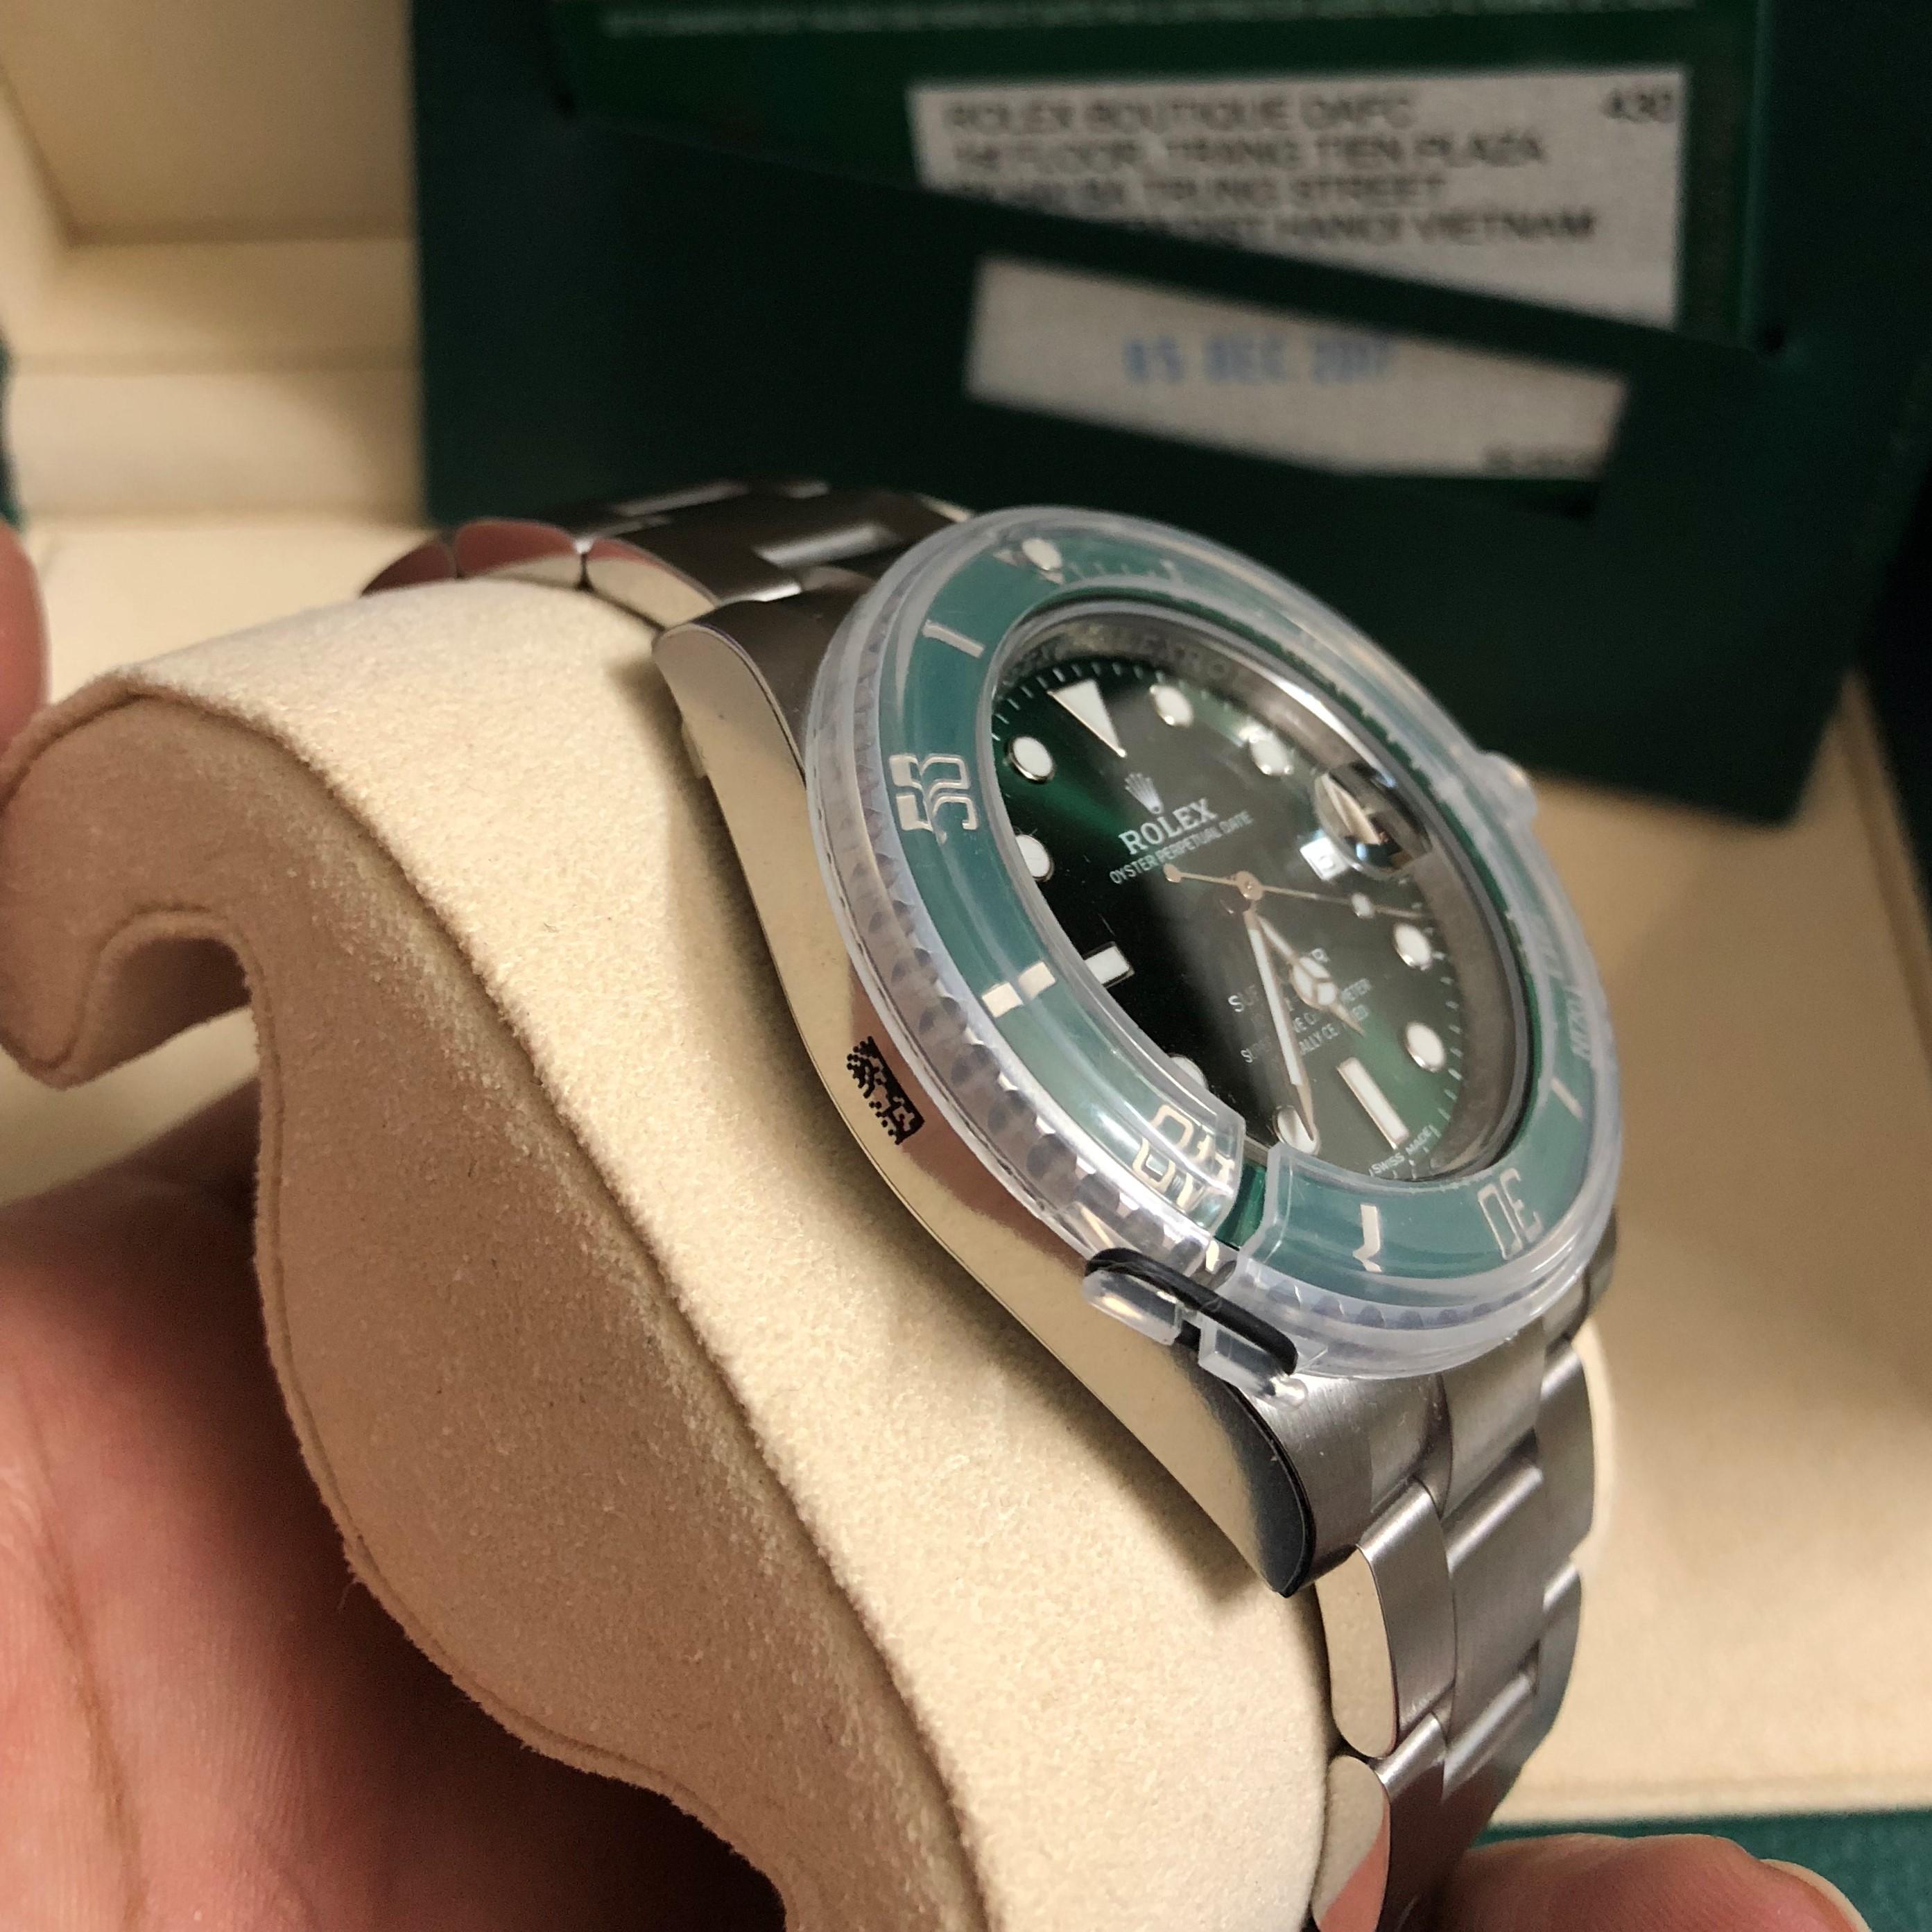 Rolex Hulk 116610 mặt xanh lá Size 40mm Fullbox 2017 - New